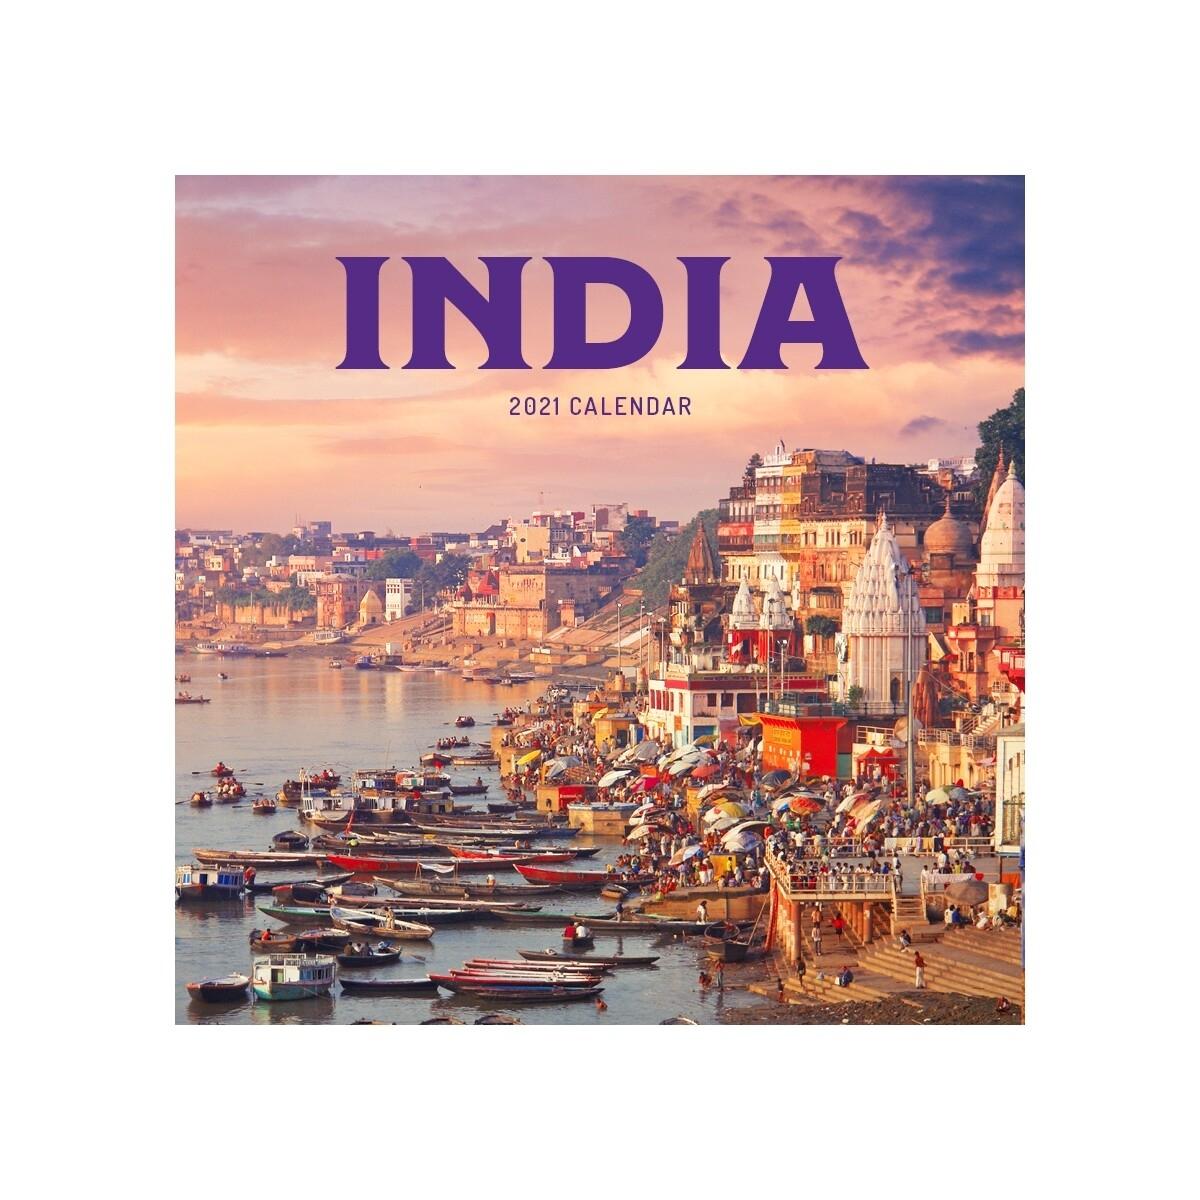 India Wall Calendar 2021